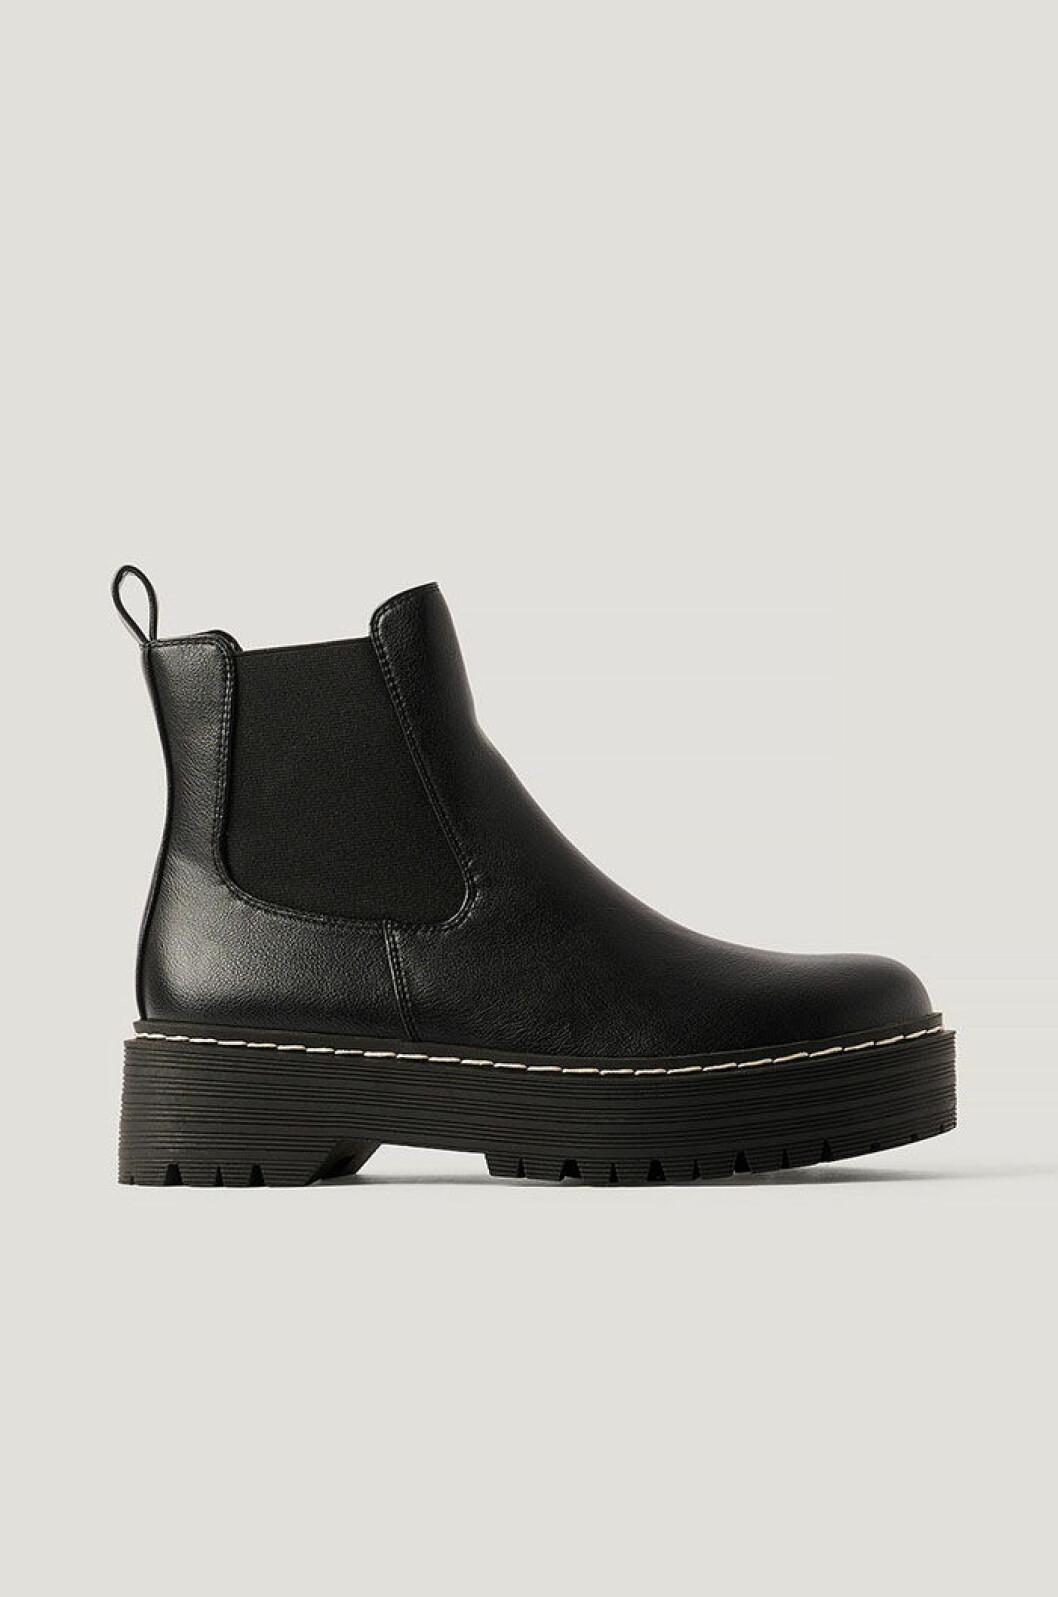 svarta-boots-gina-tricot